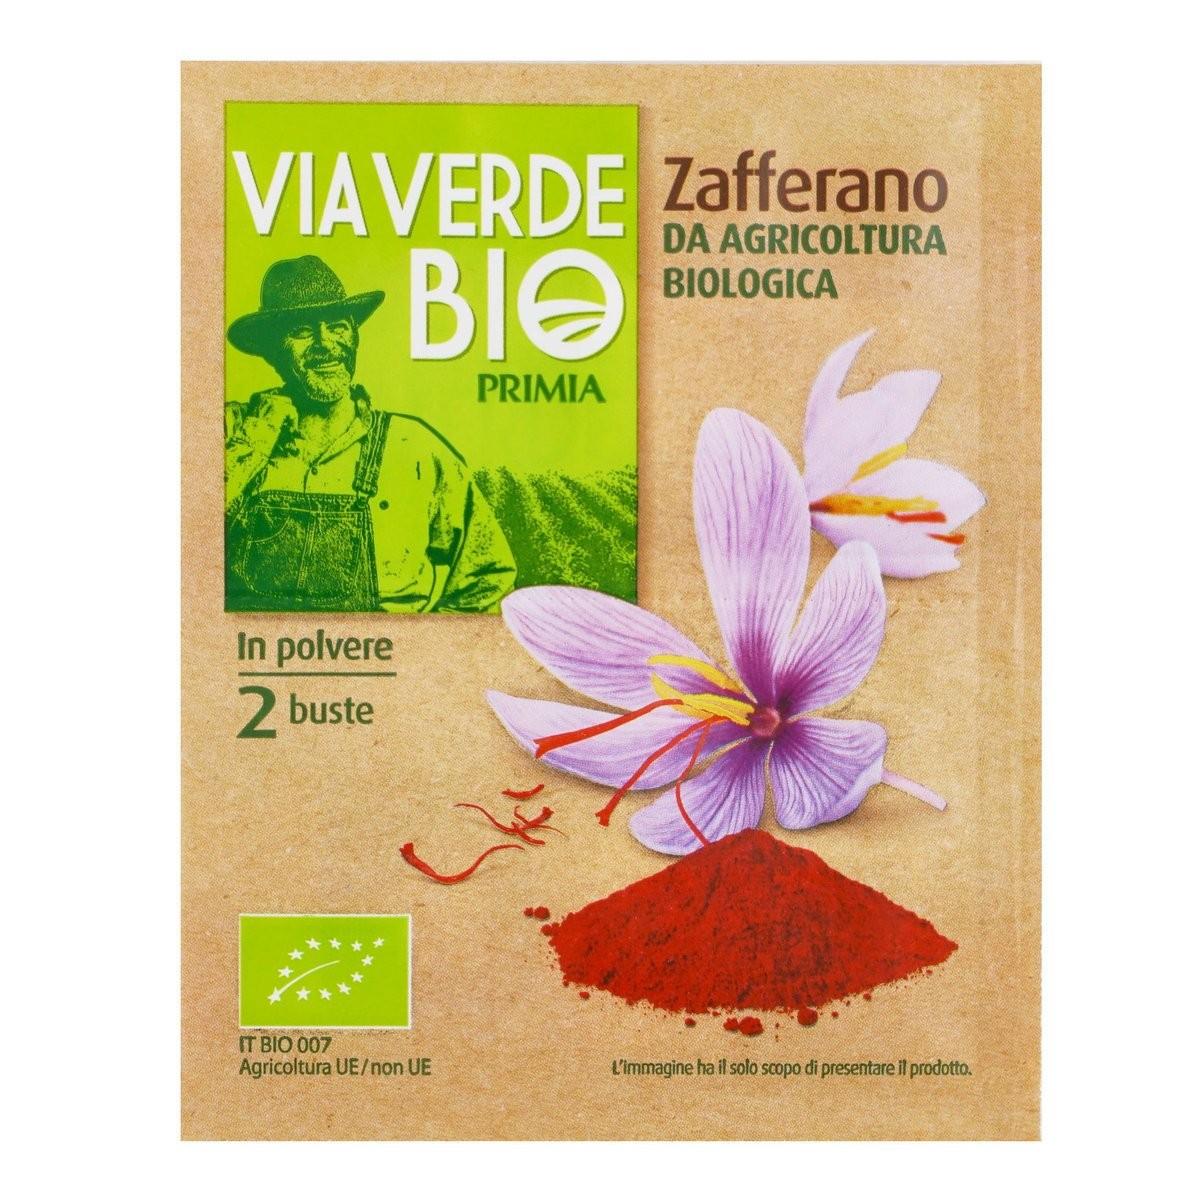 Primia Zafferano Via Verde Bio